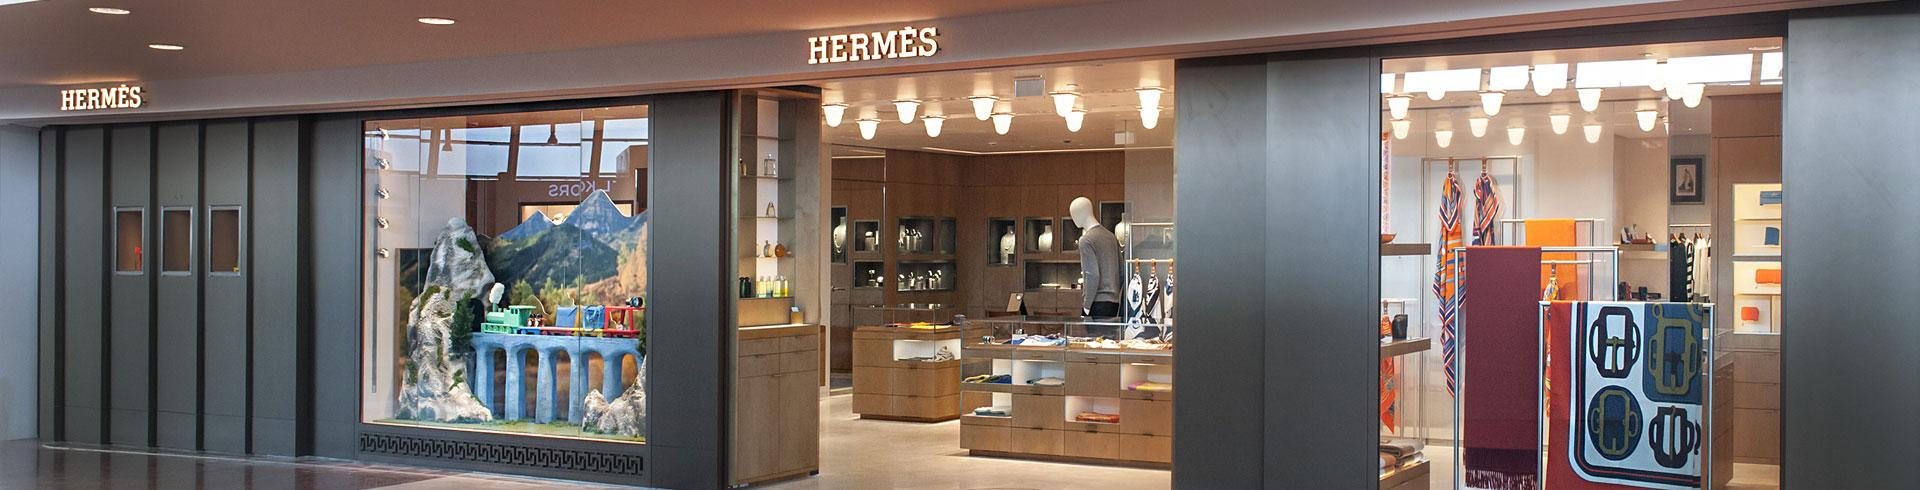 9e030b5c8664 Hermès   Fashion   Accessories   Terminal 1   Shops   Services   La ...